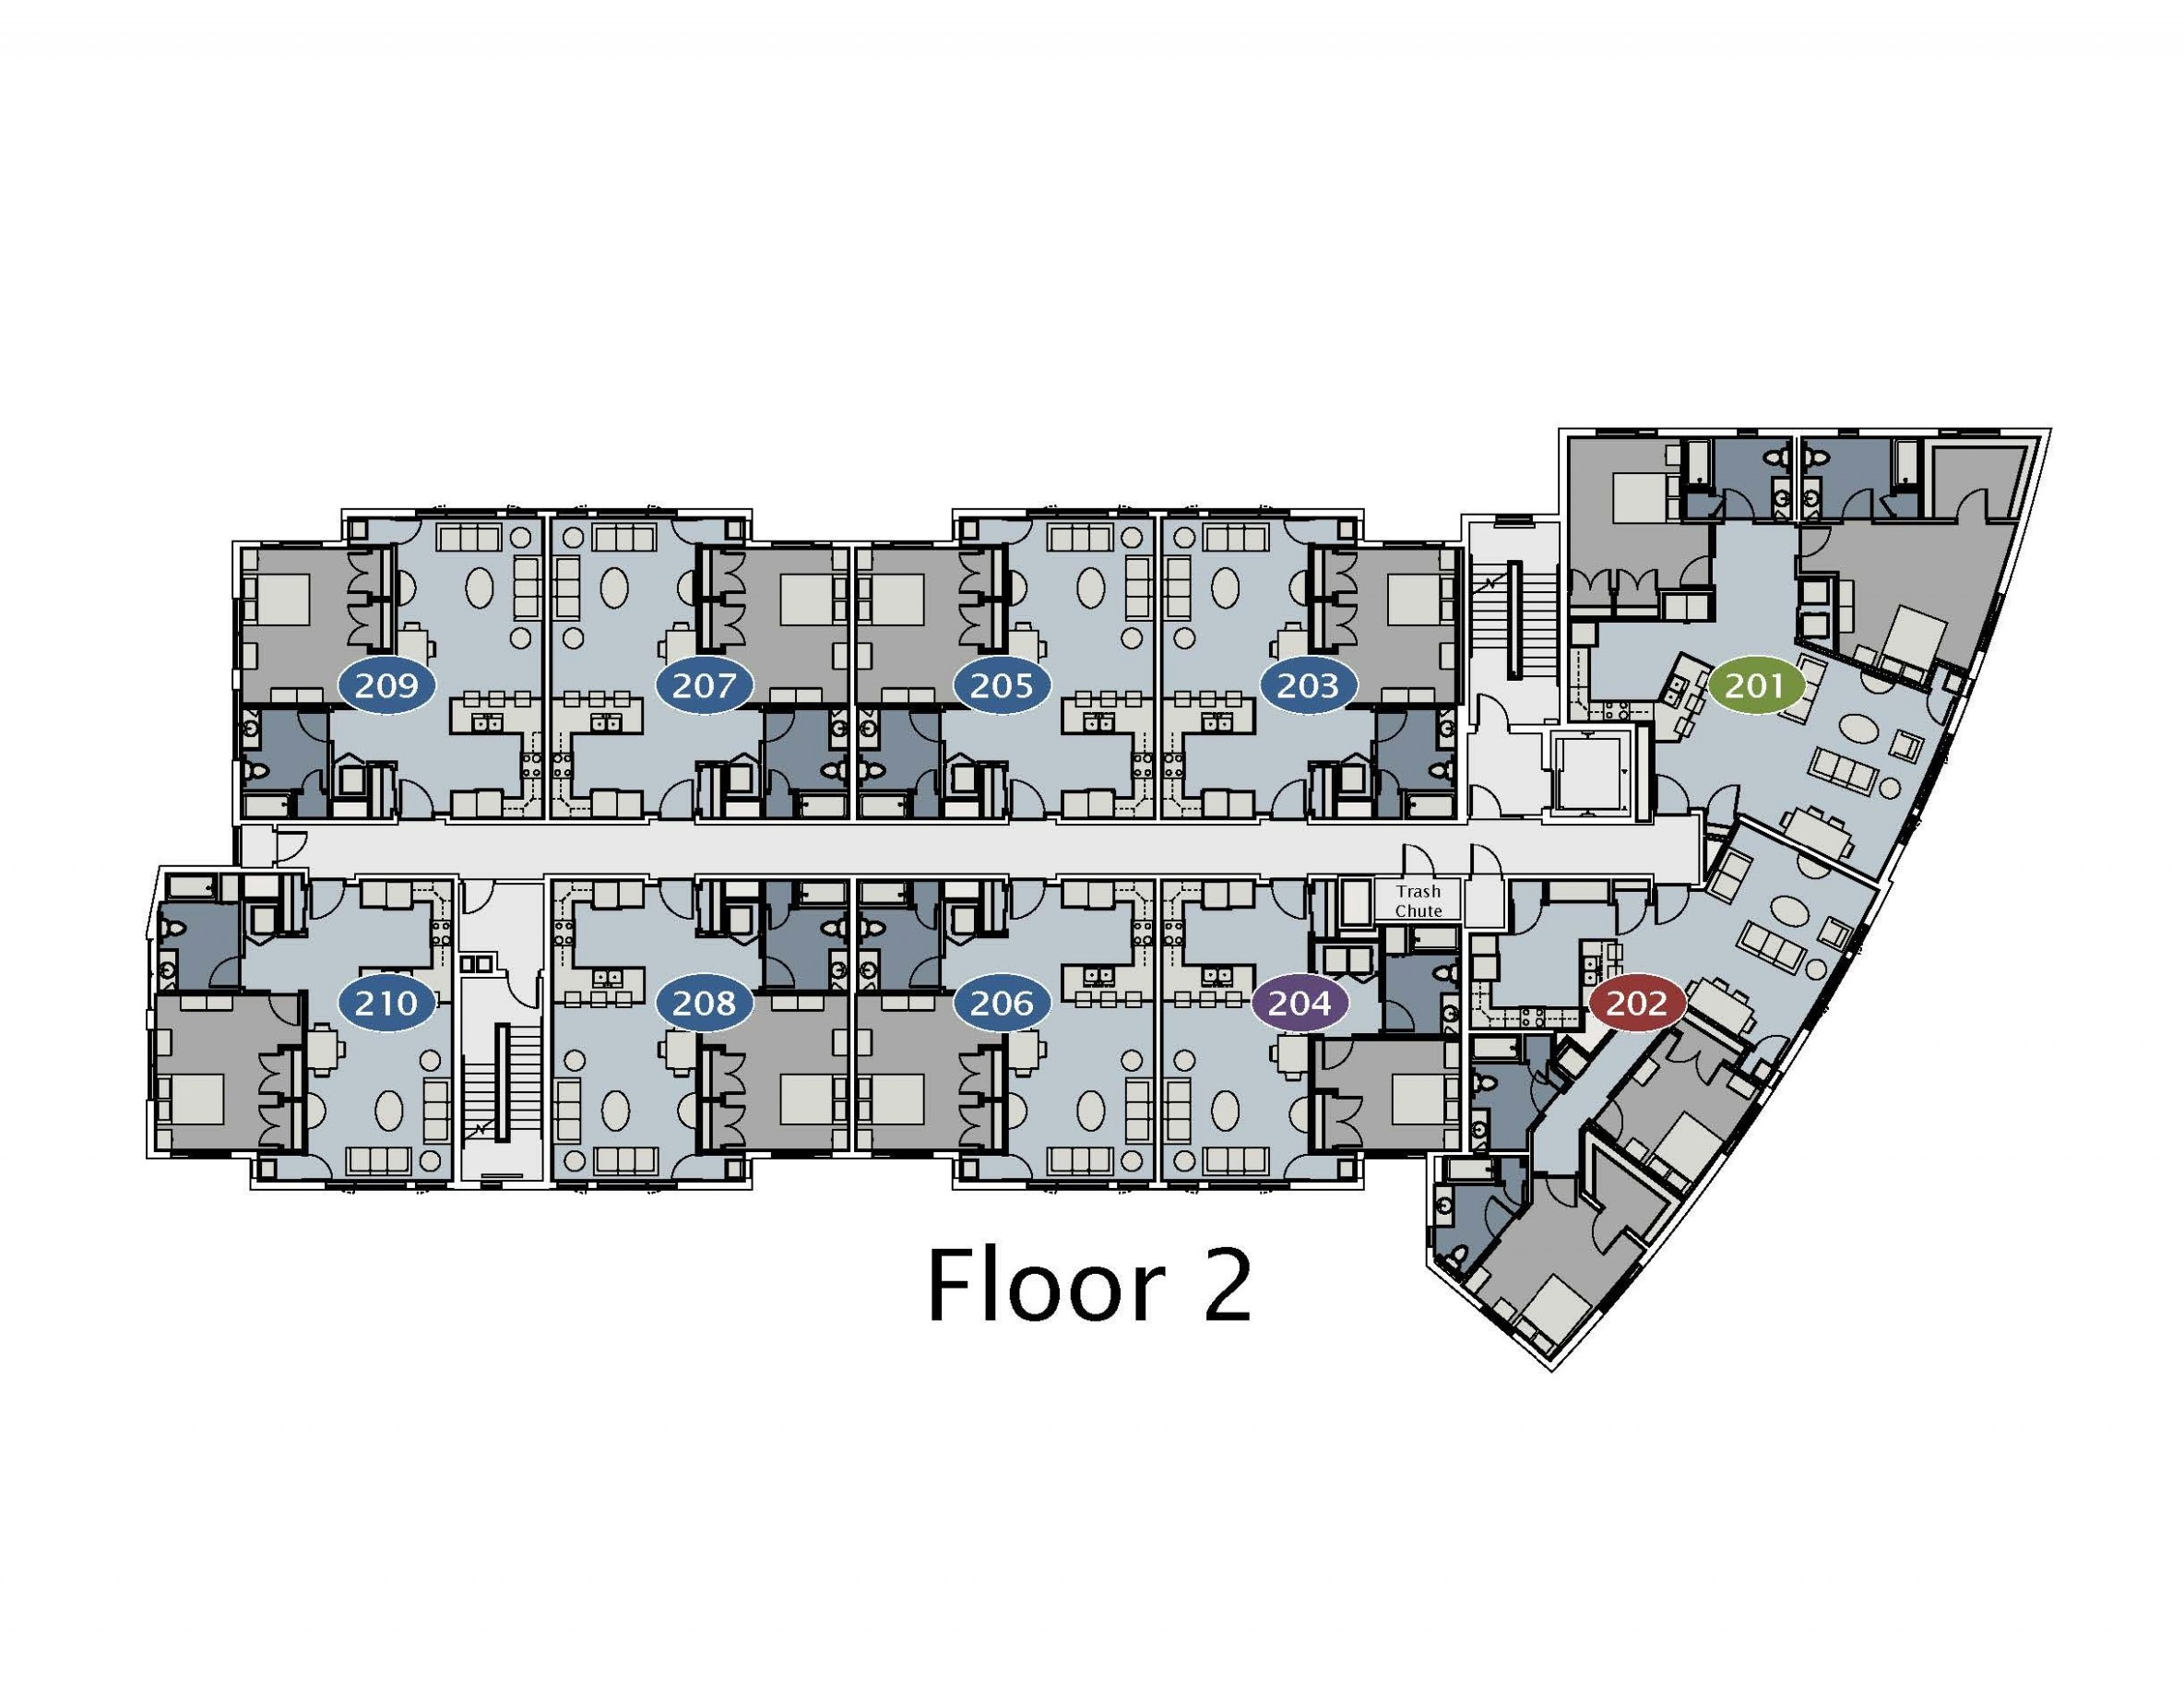 Home Plans Design Apartment Complex Floor  Floor plan design  - Apartment Architecture Design Plans